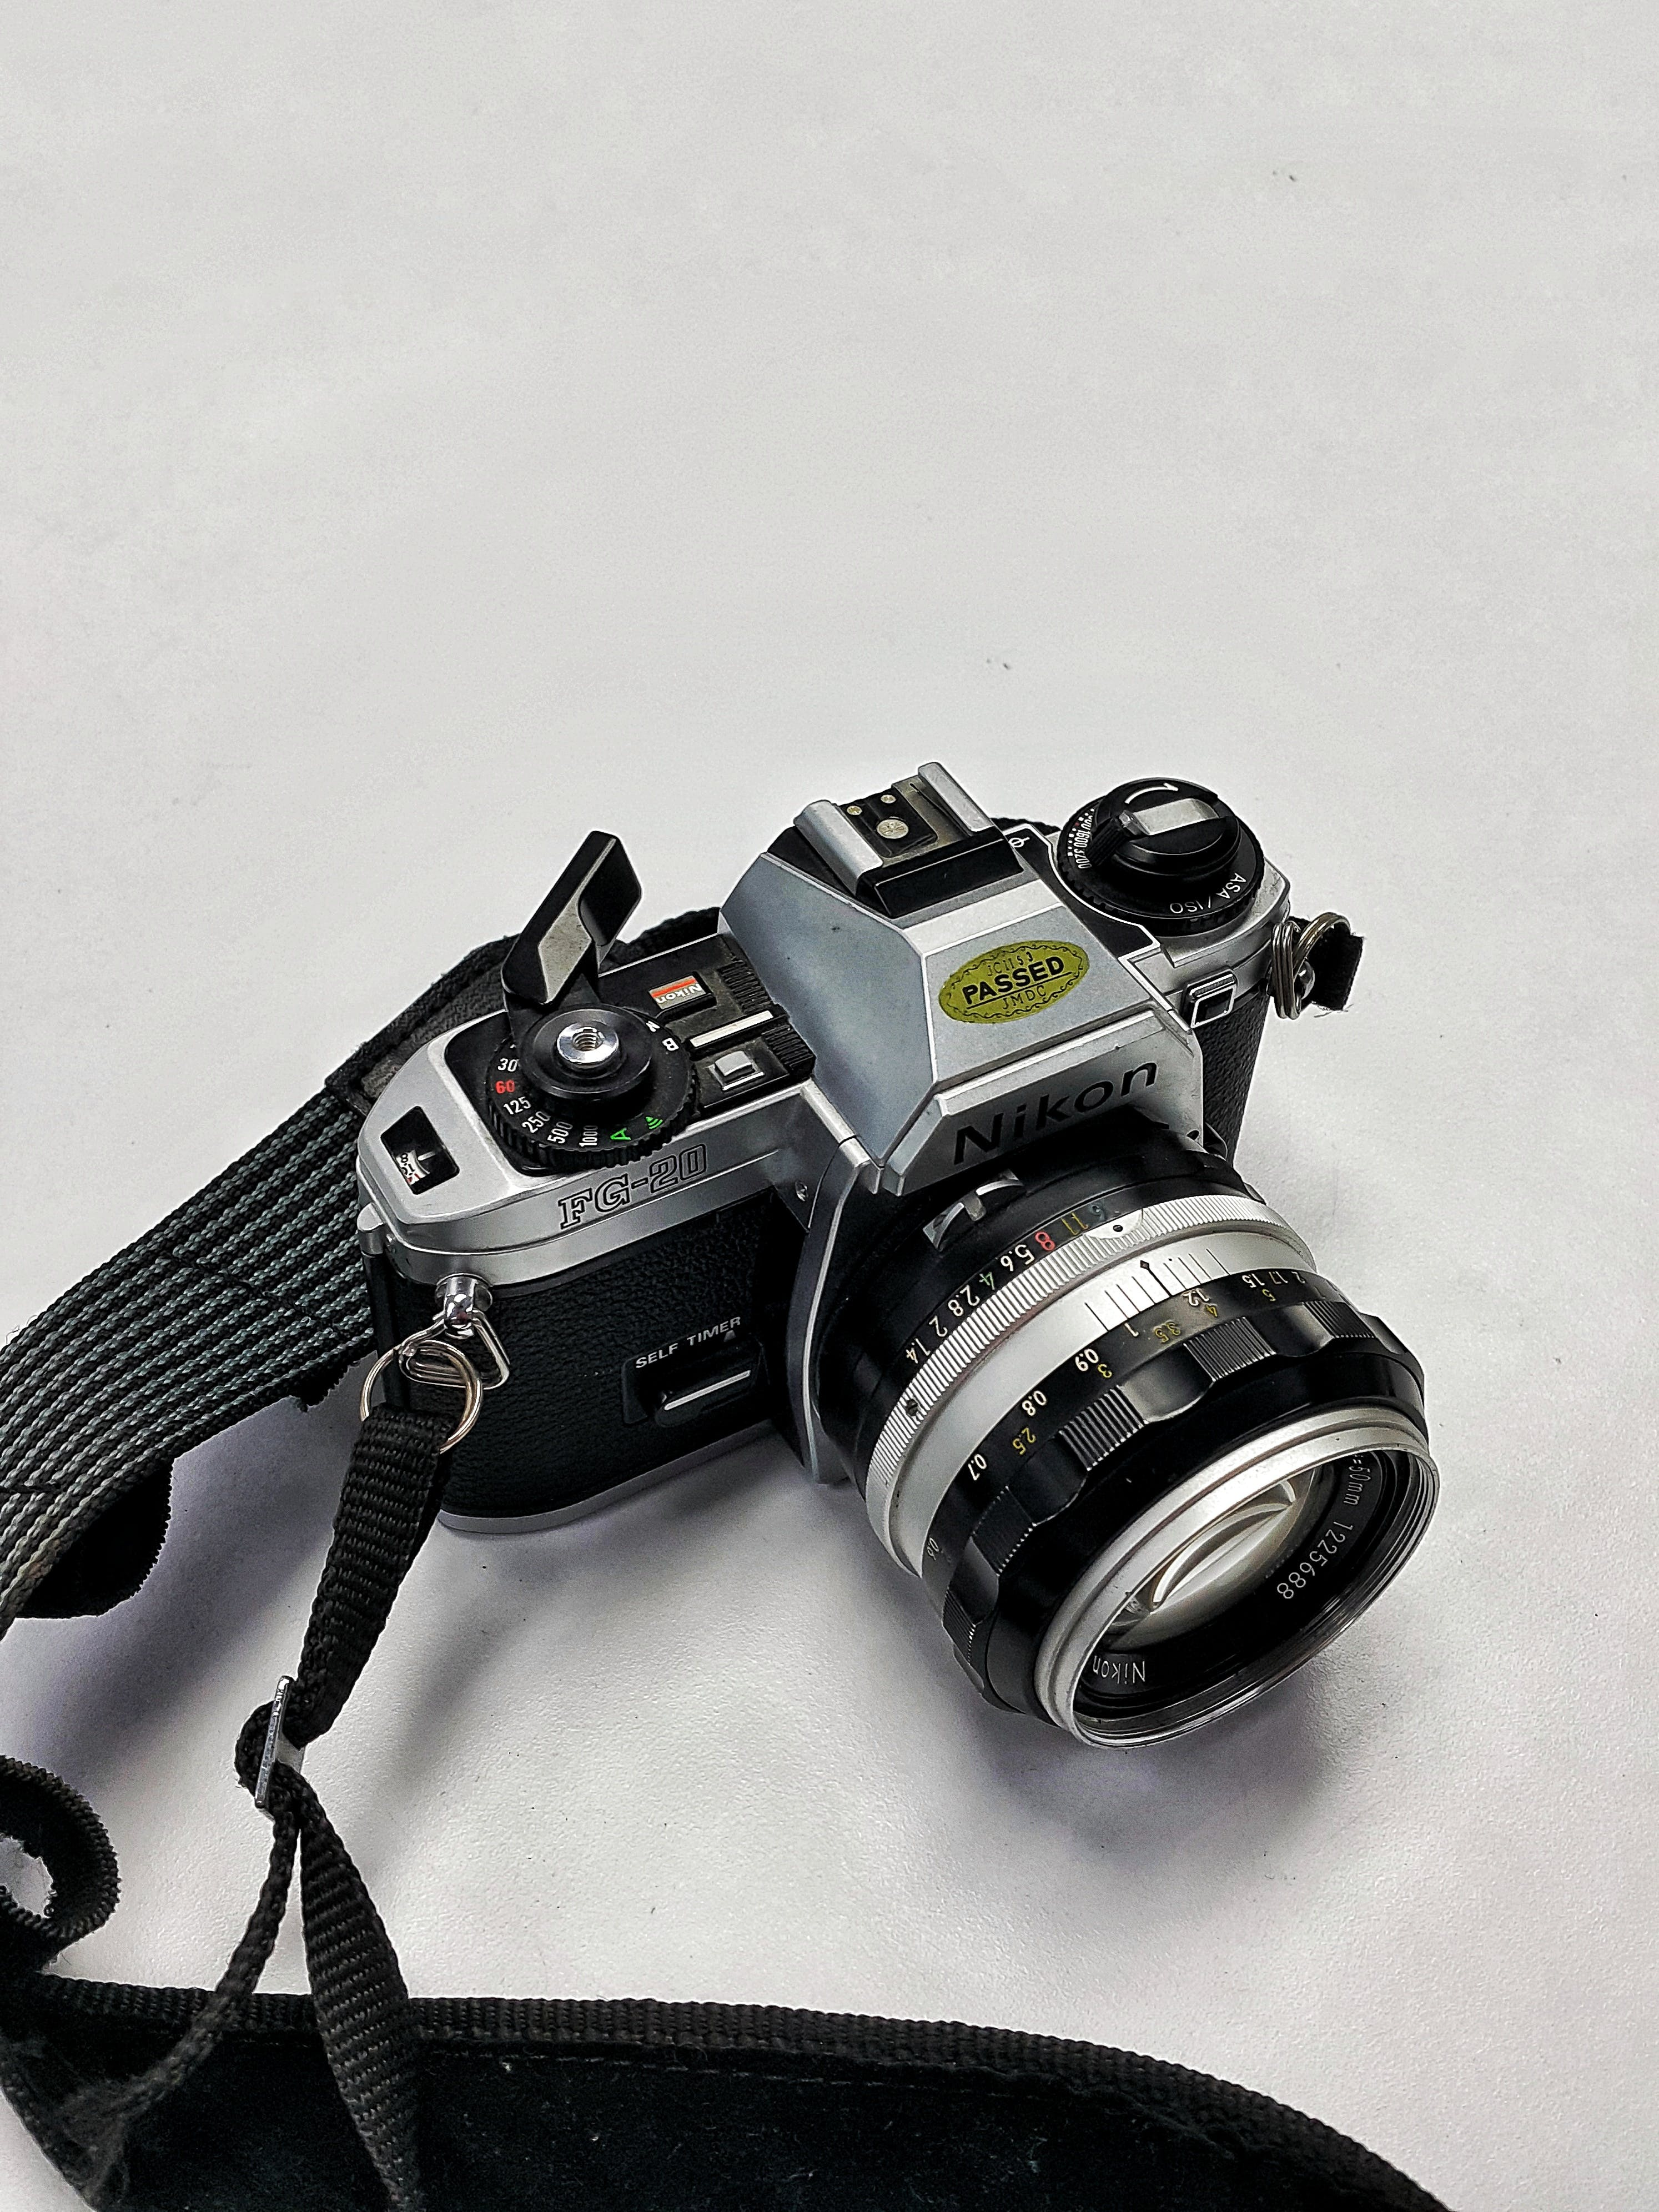 Free stock photo of 35mmm, art, camera, imaging